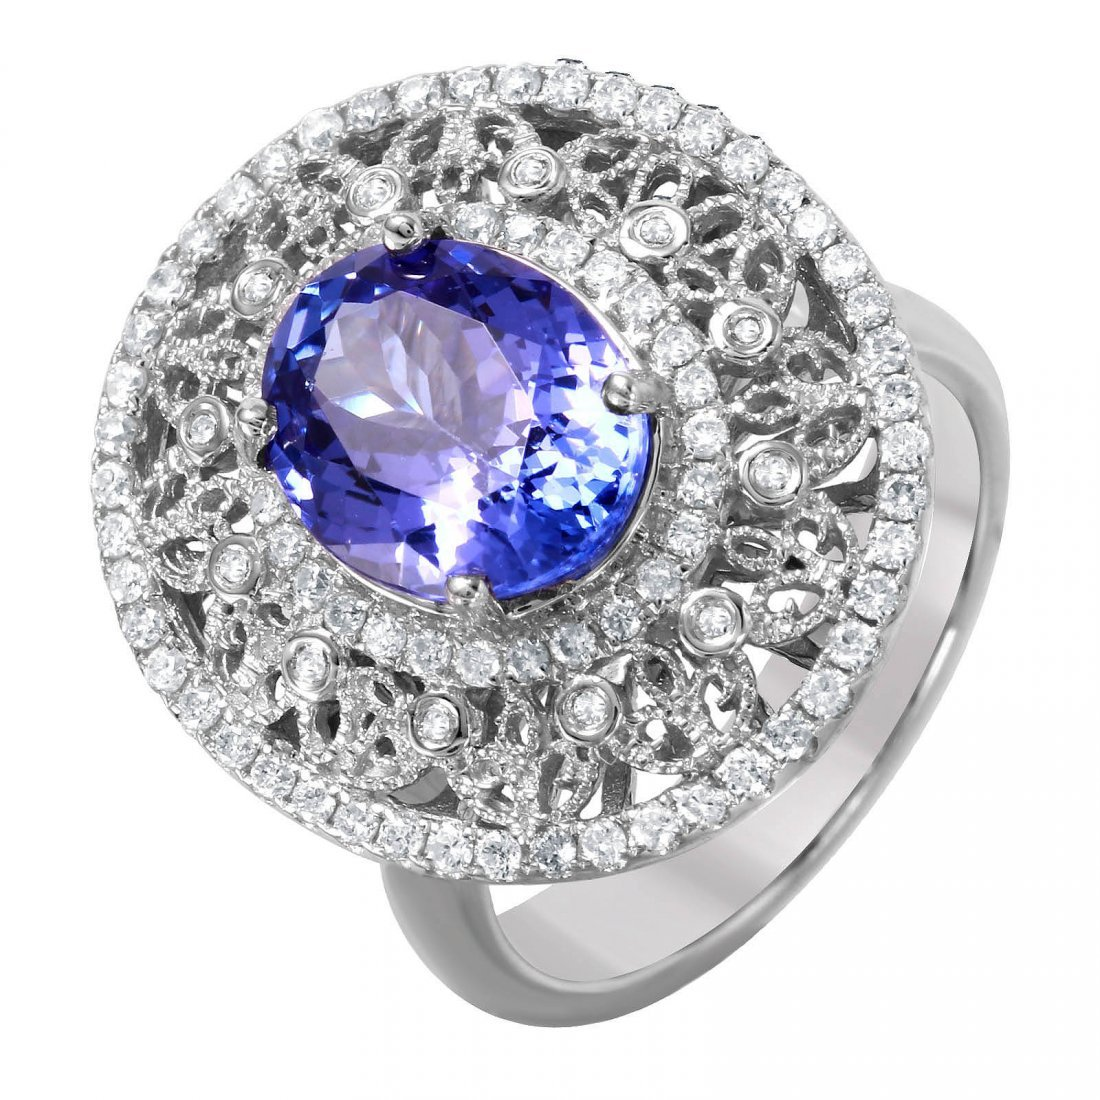 14KT White Gold Tanzanite and Diamond Ring - #1497